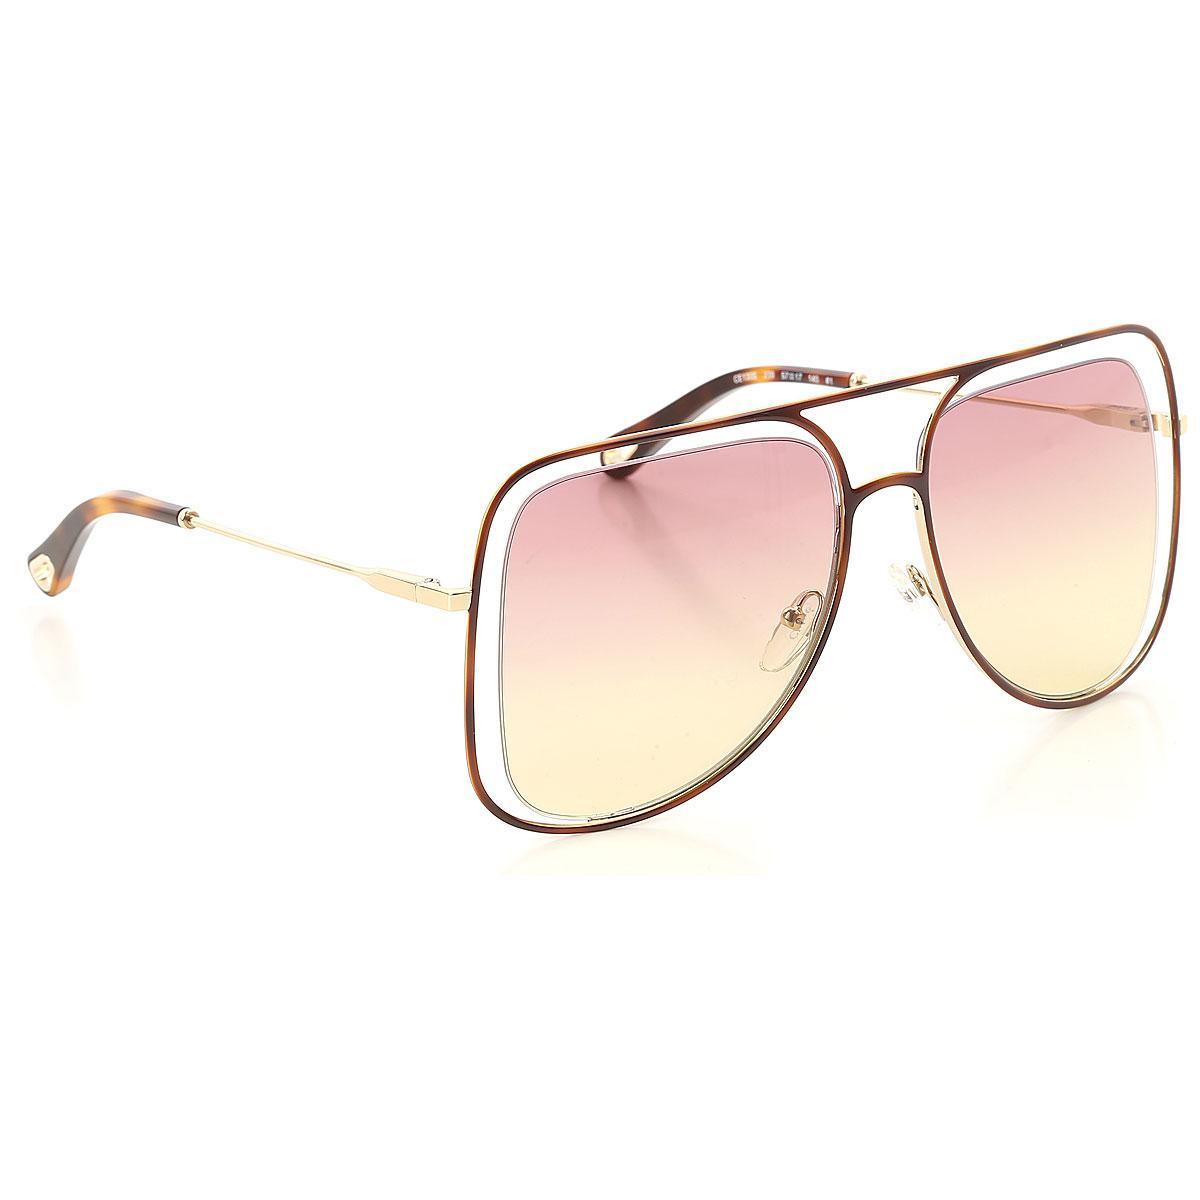 15c765e1a32 Lyst - Chloé Sunglasses - Save 20.855614973262036%